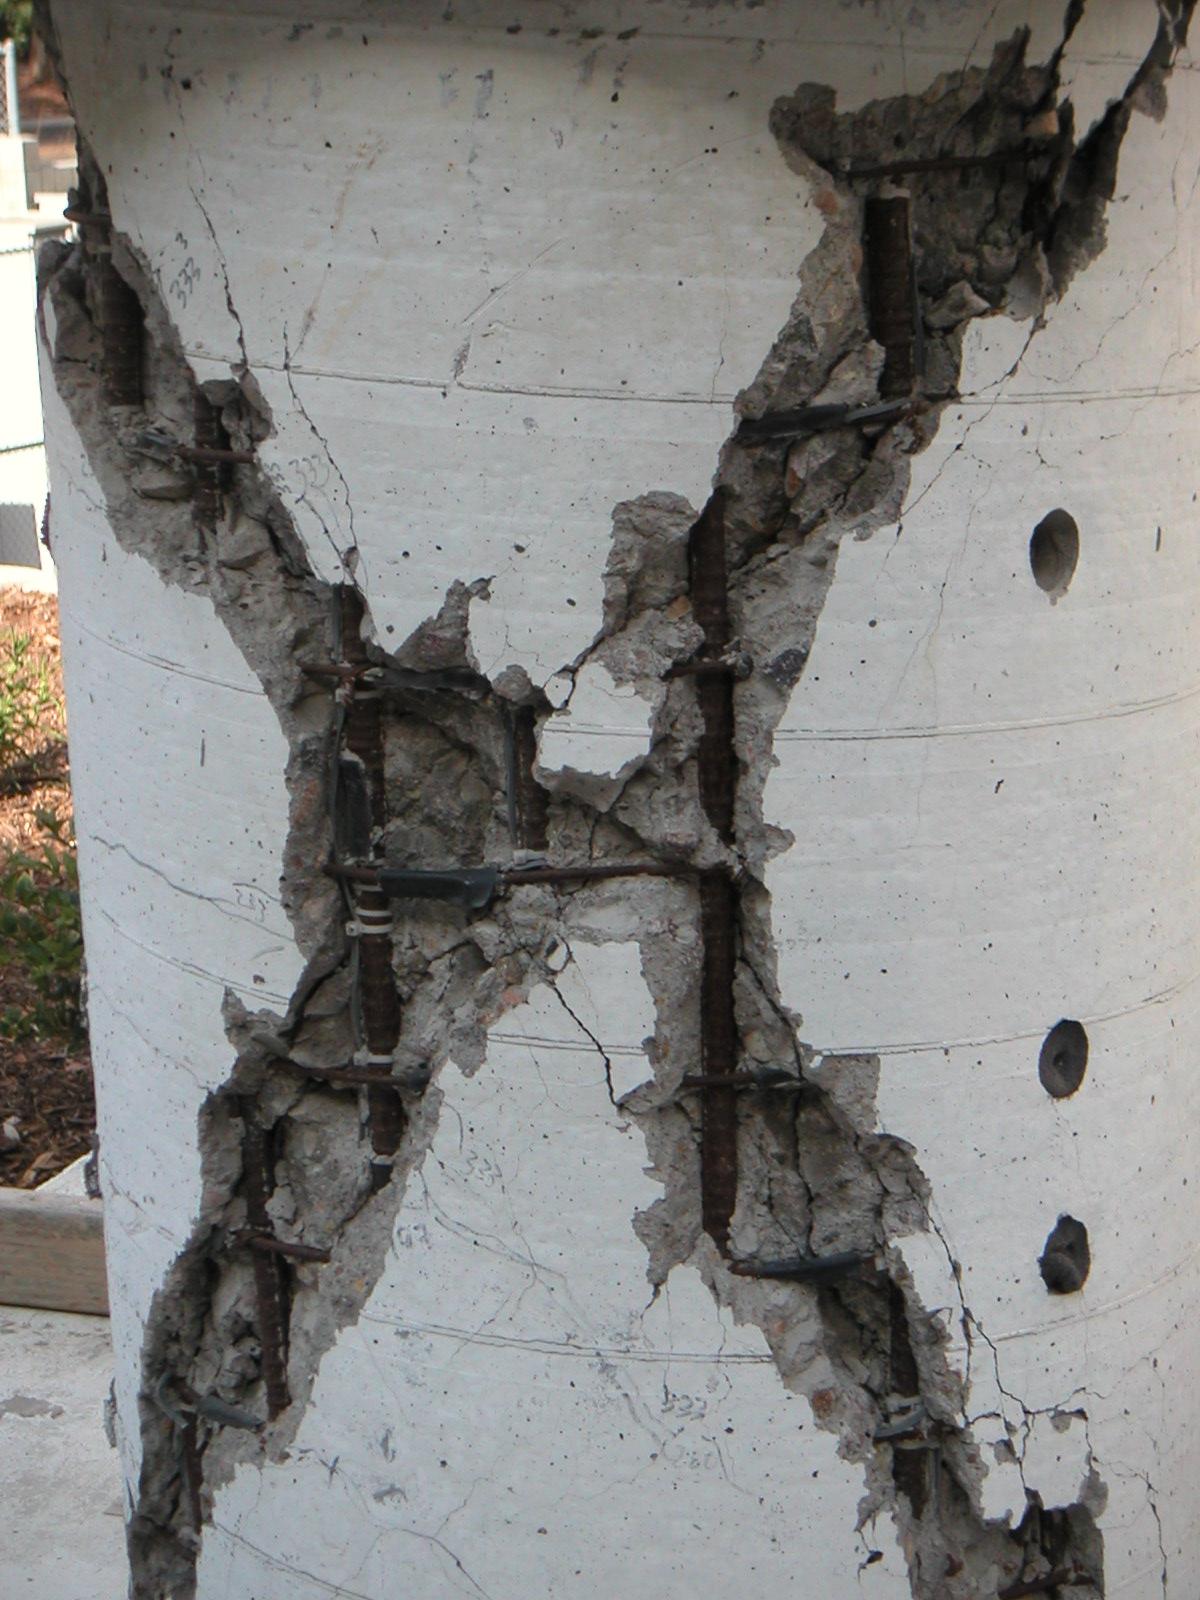 Reinforced Cement Concrete : Transvaginal mesh risks and lawsuits